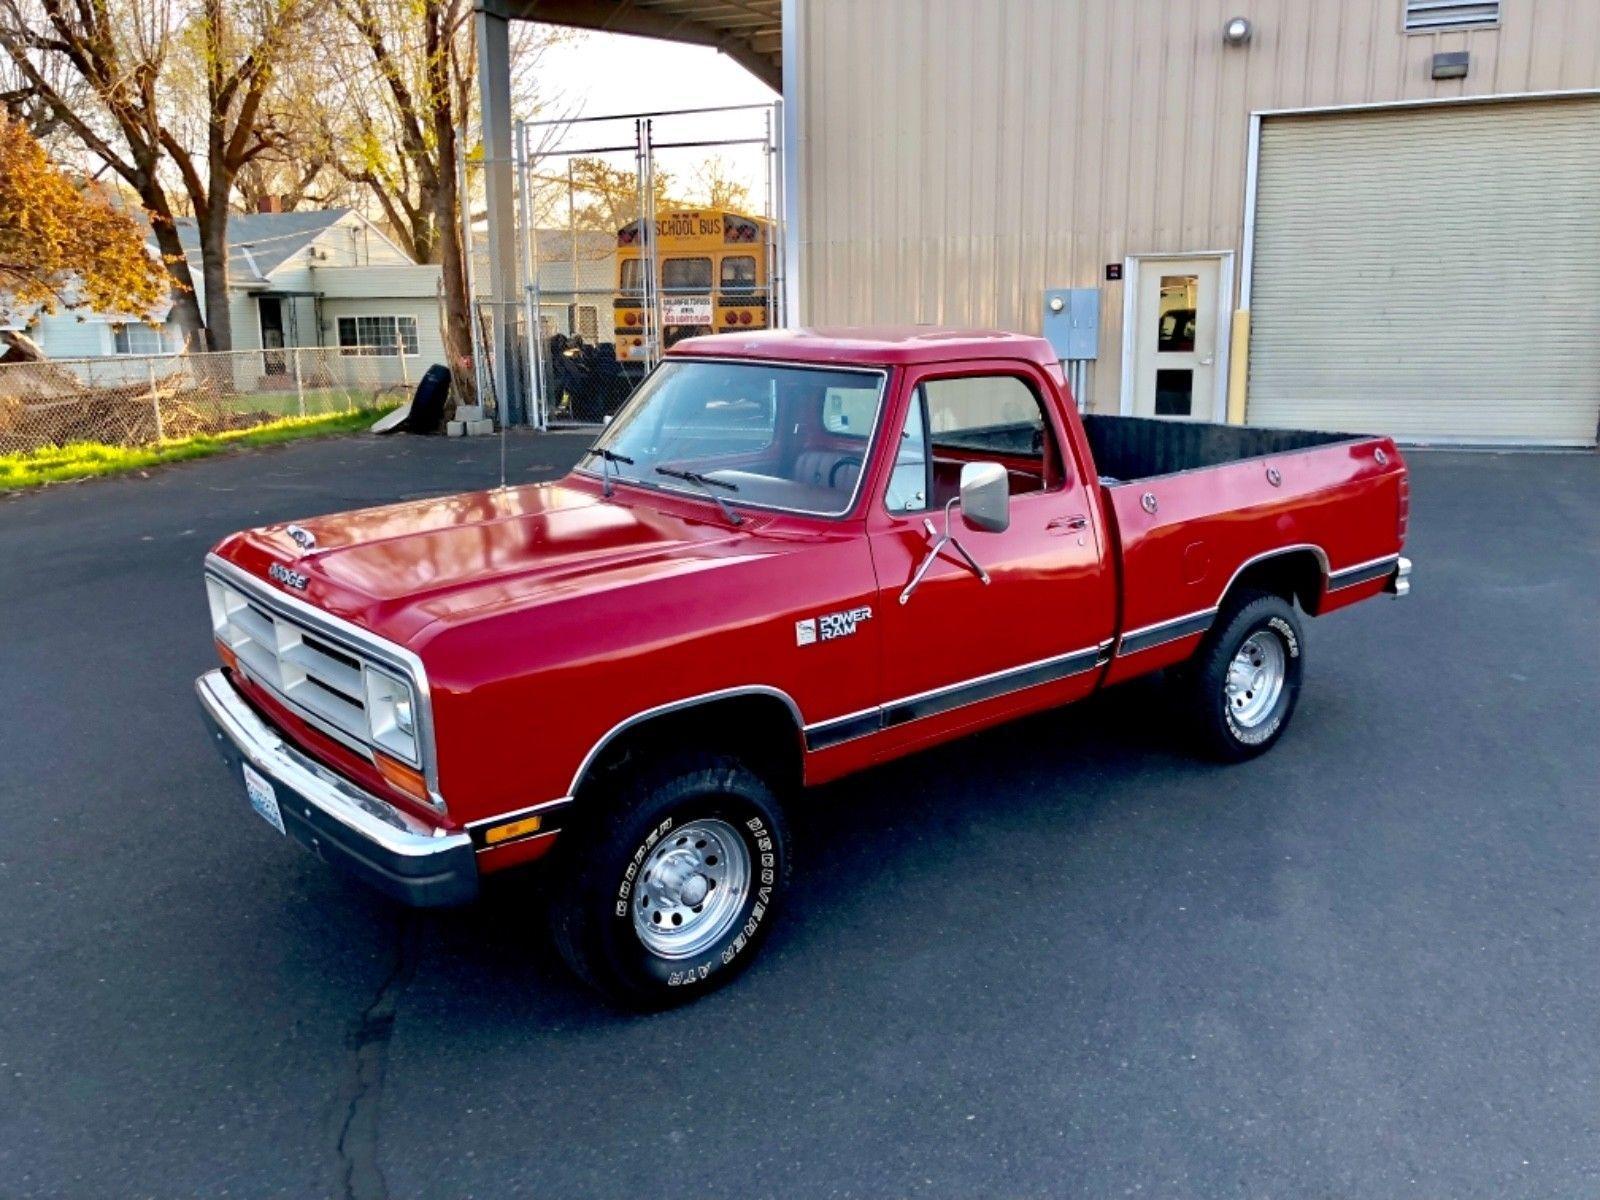 1987 Dodge Power Ram 4x4 Luxury Autos Mall Pinterest 1980 Pickup Truck Shortbed 1986 1985 1988 1983 1982 1989